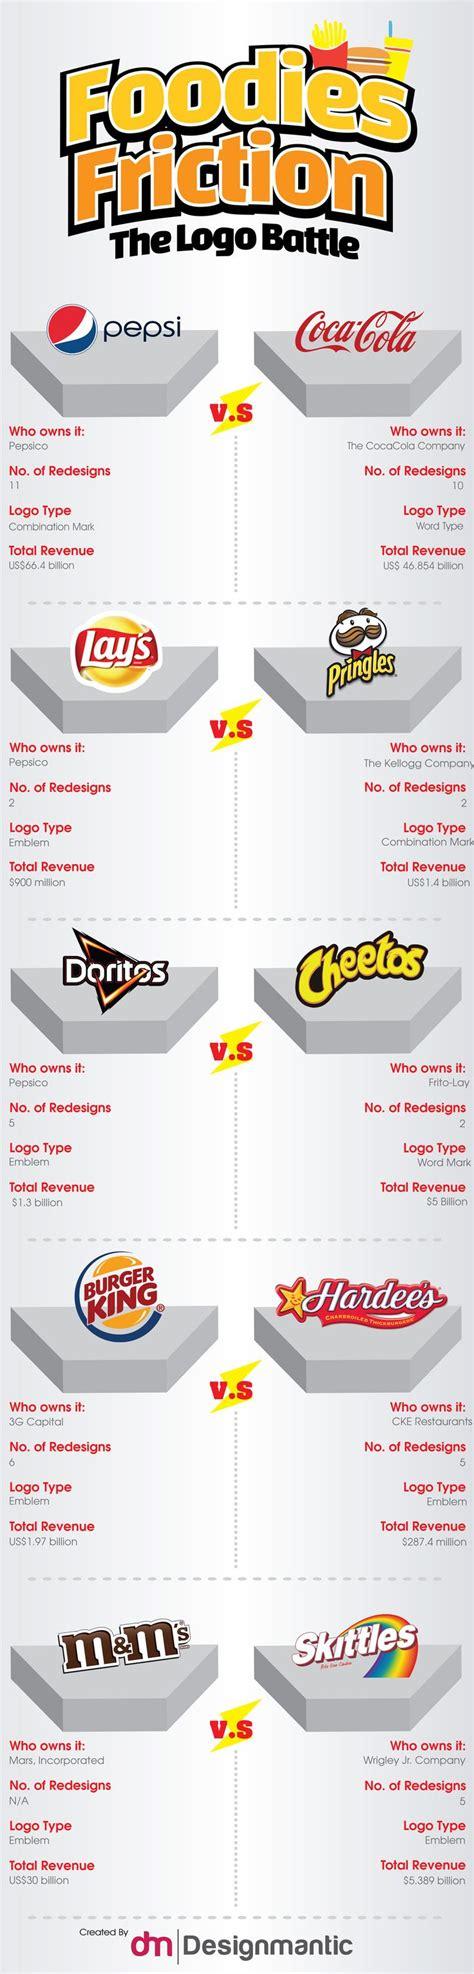 designmantic infographics 17 best images about logo design on pinterest negative